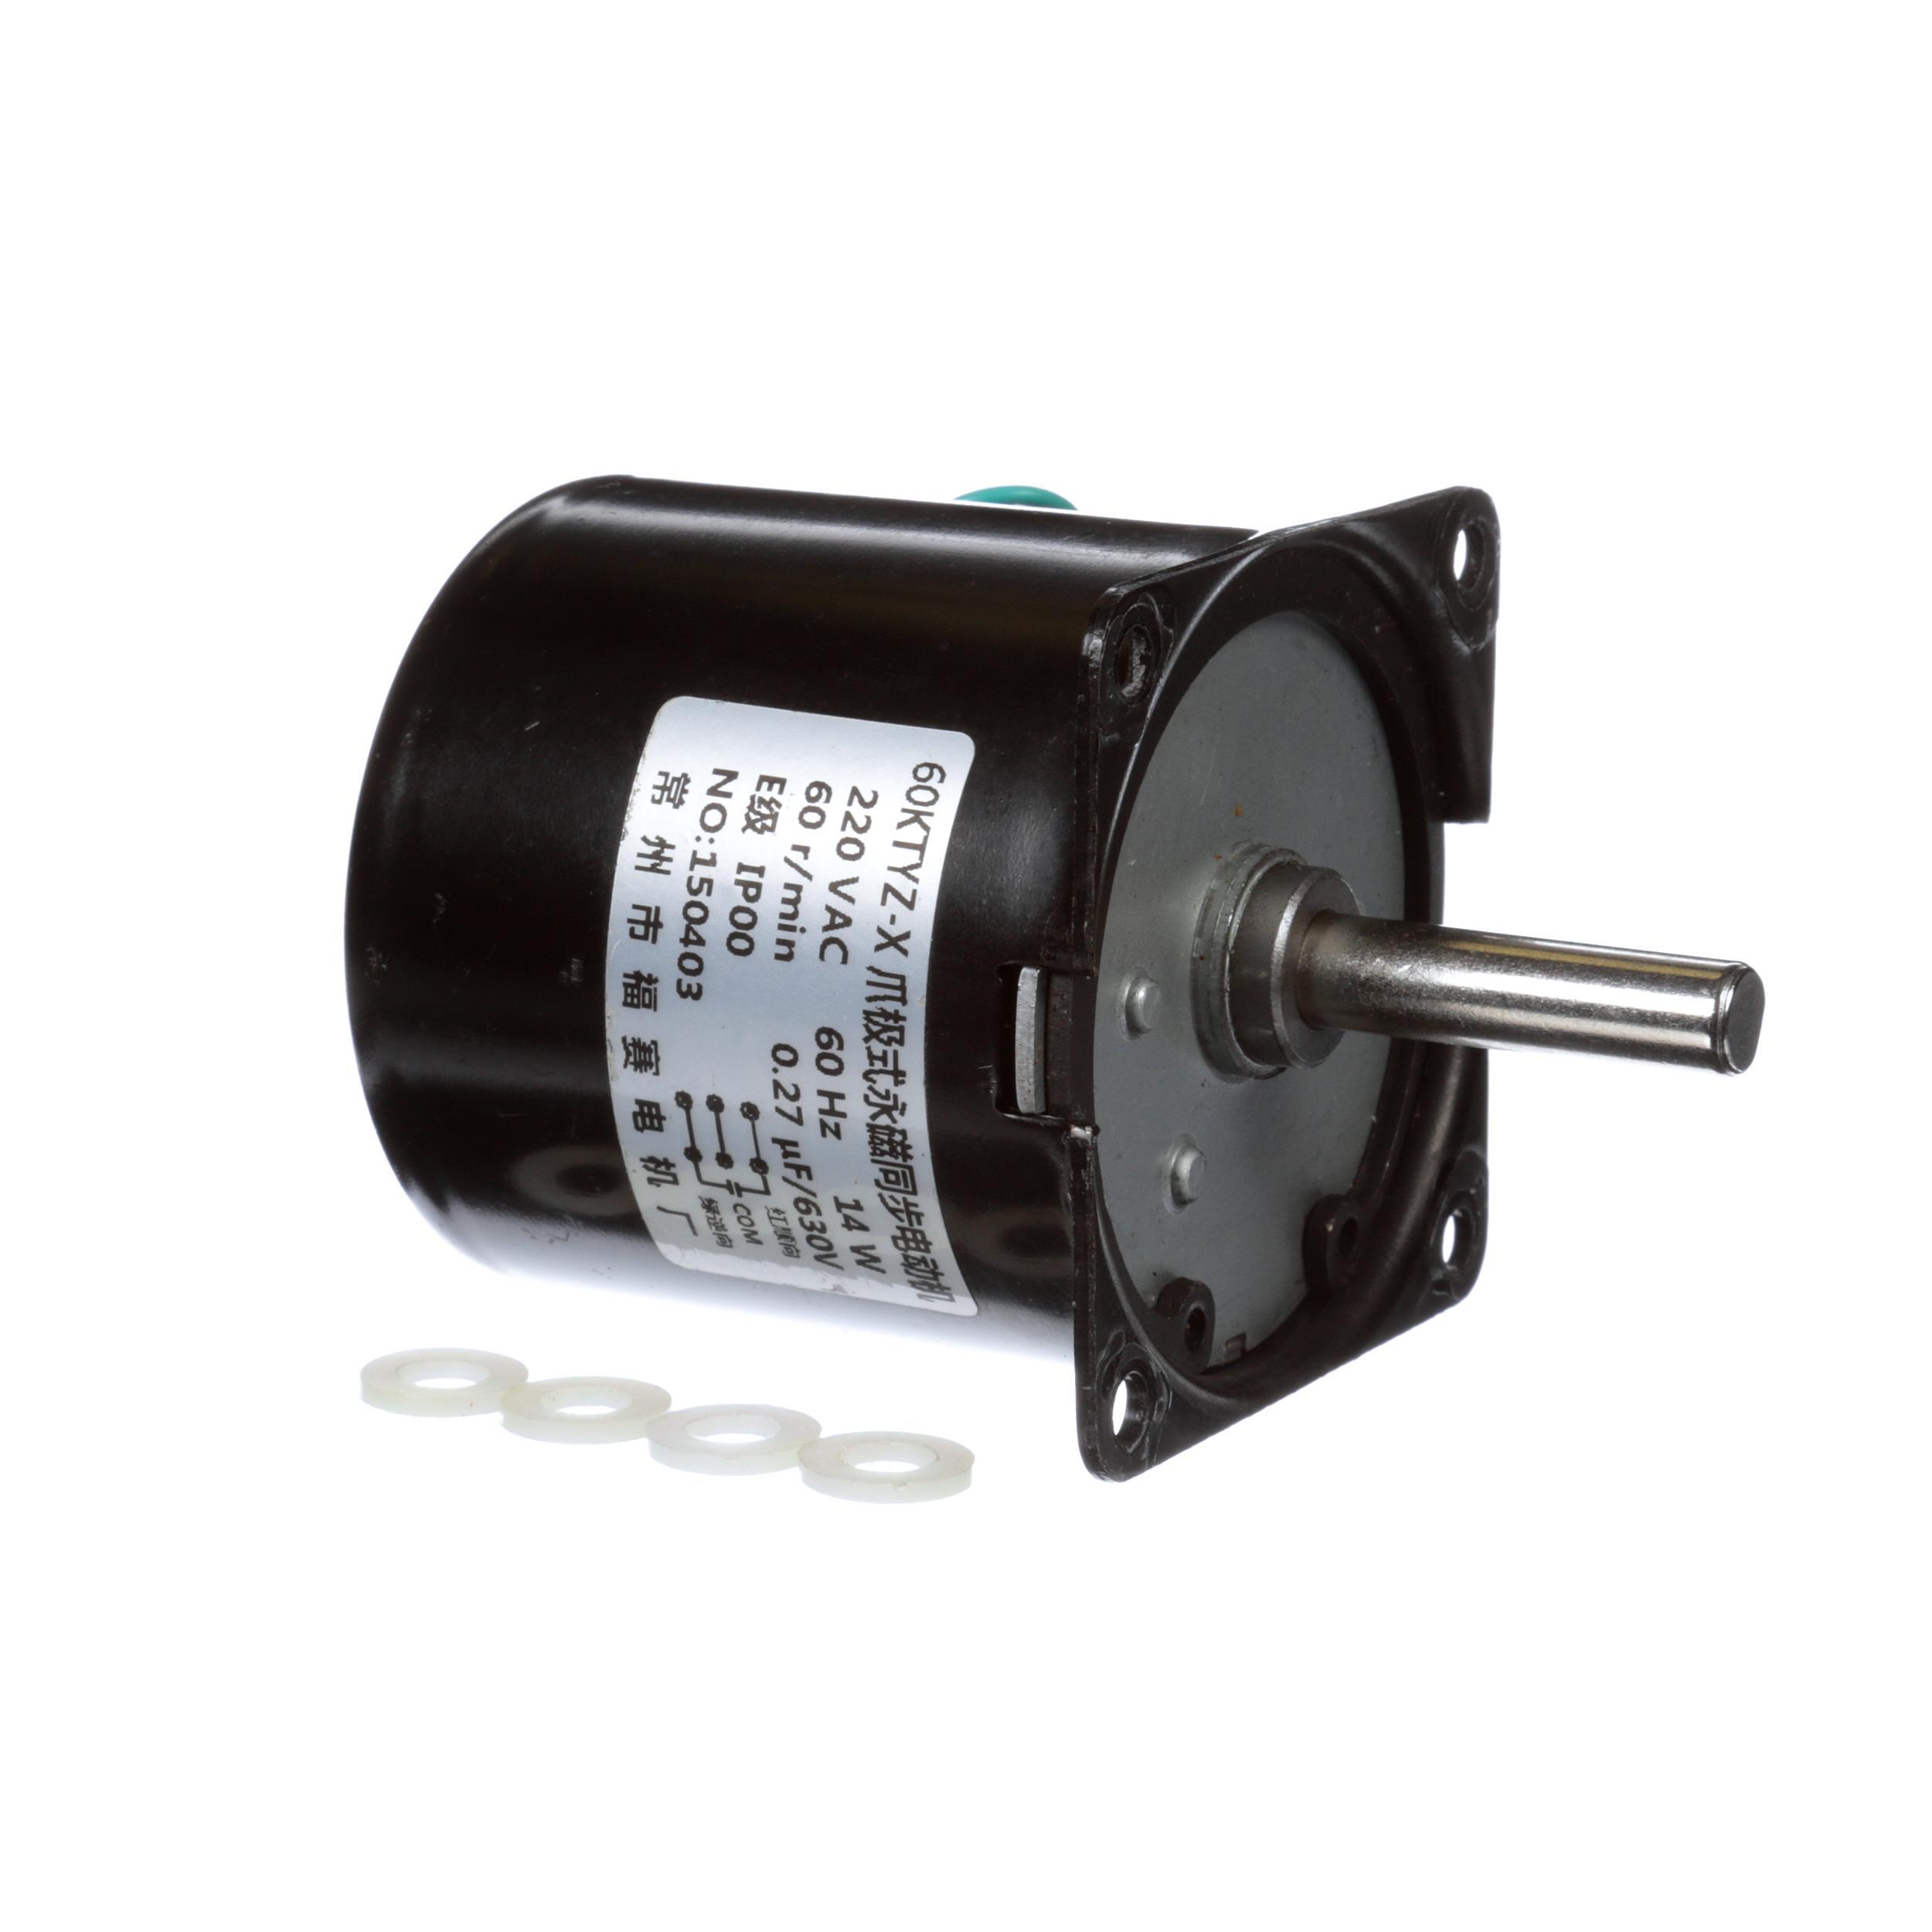 Donper usa hopper agitator motor part 130101141 for Motor manufacturers in usa